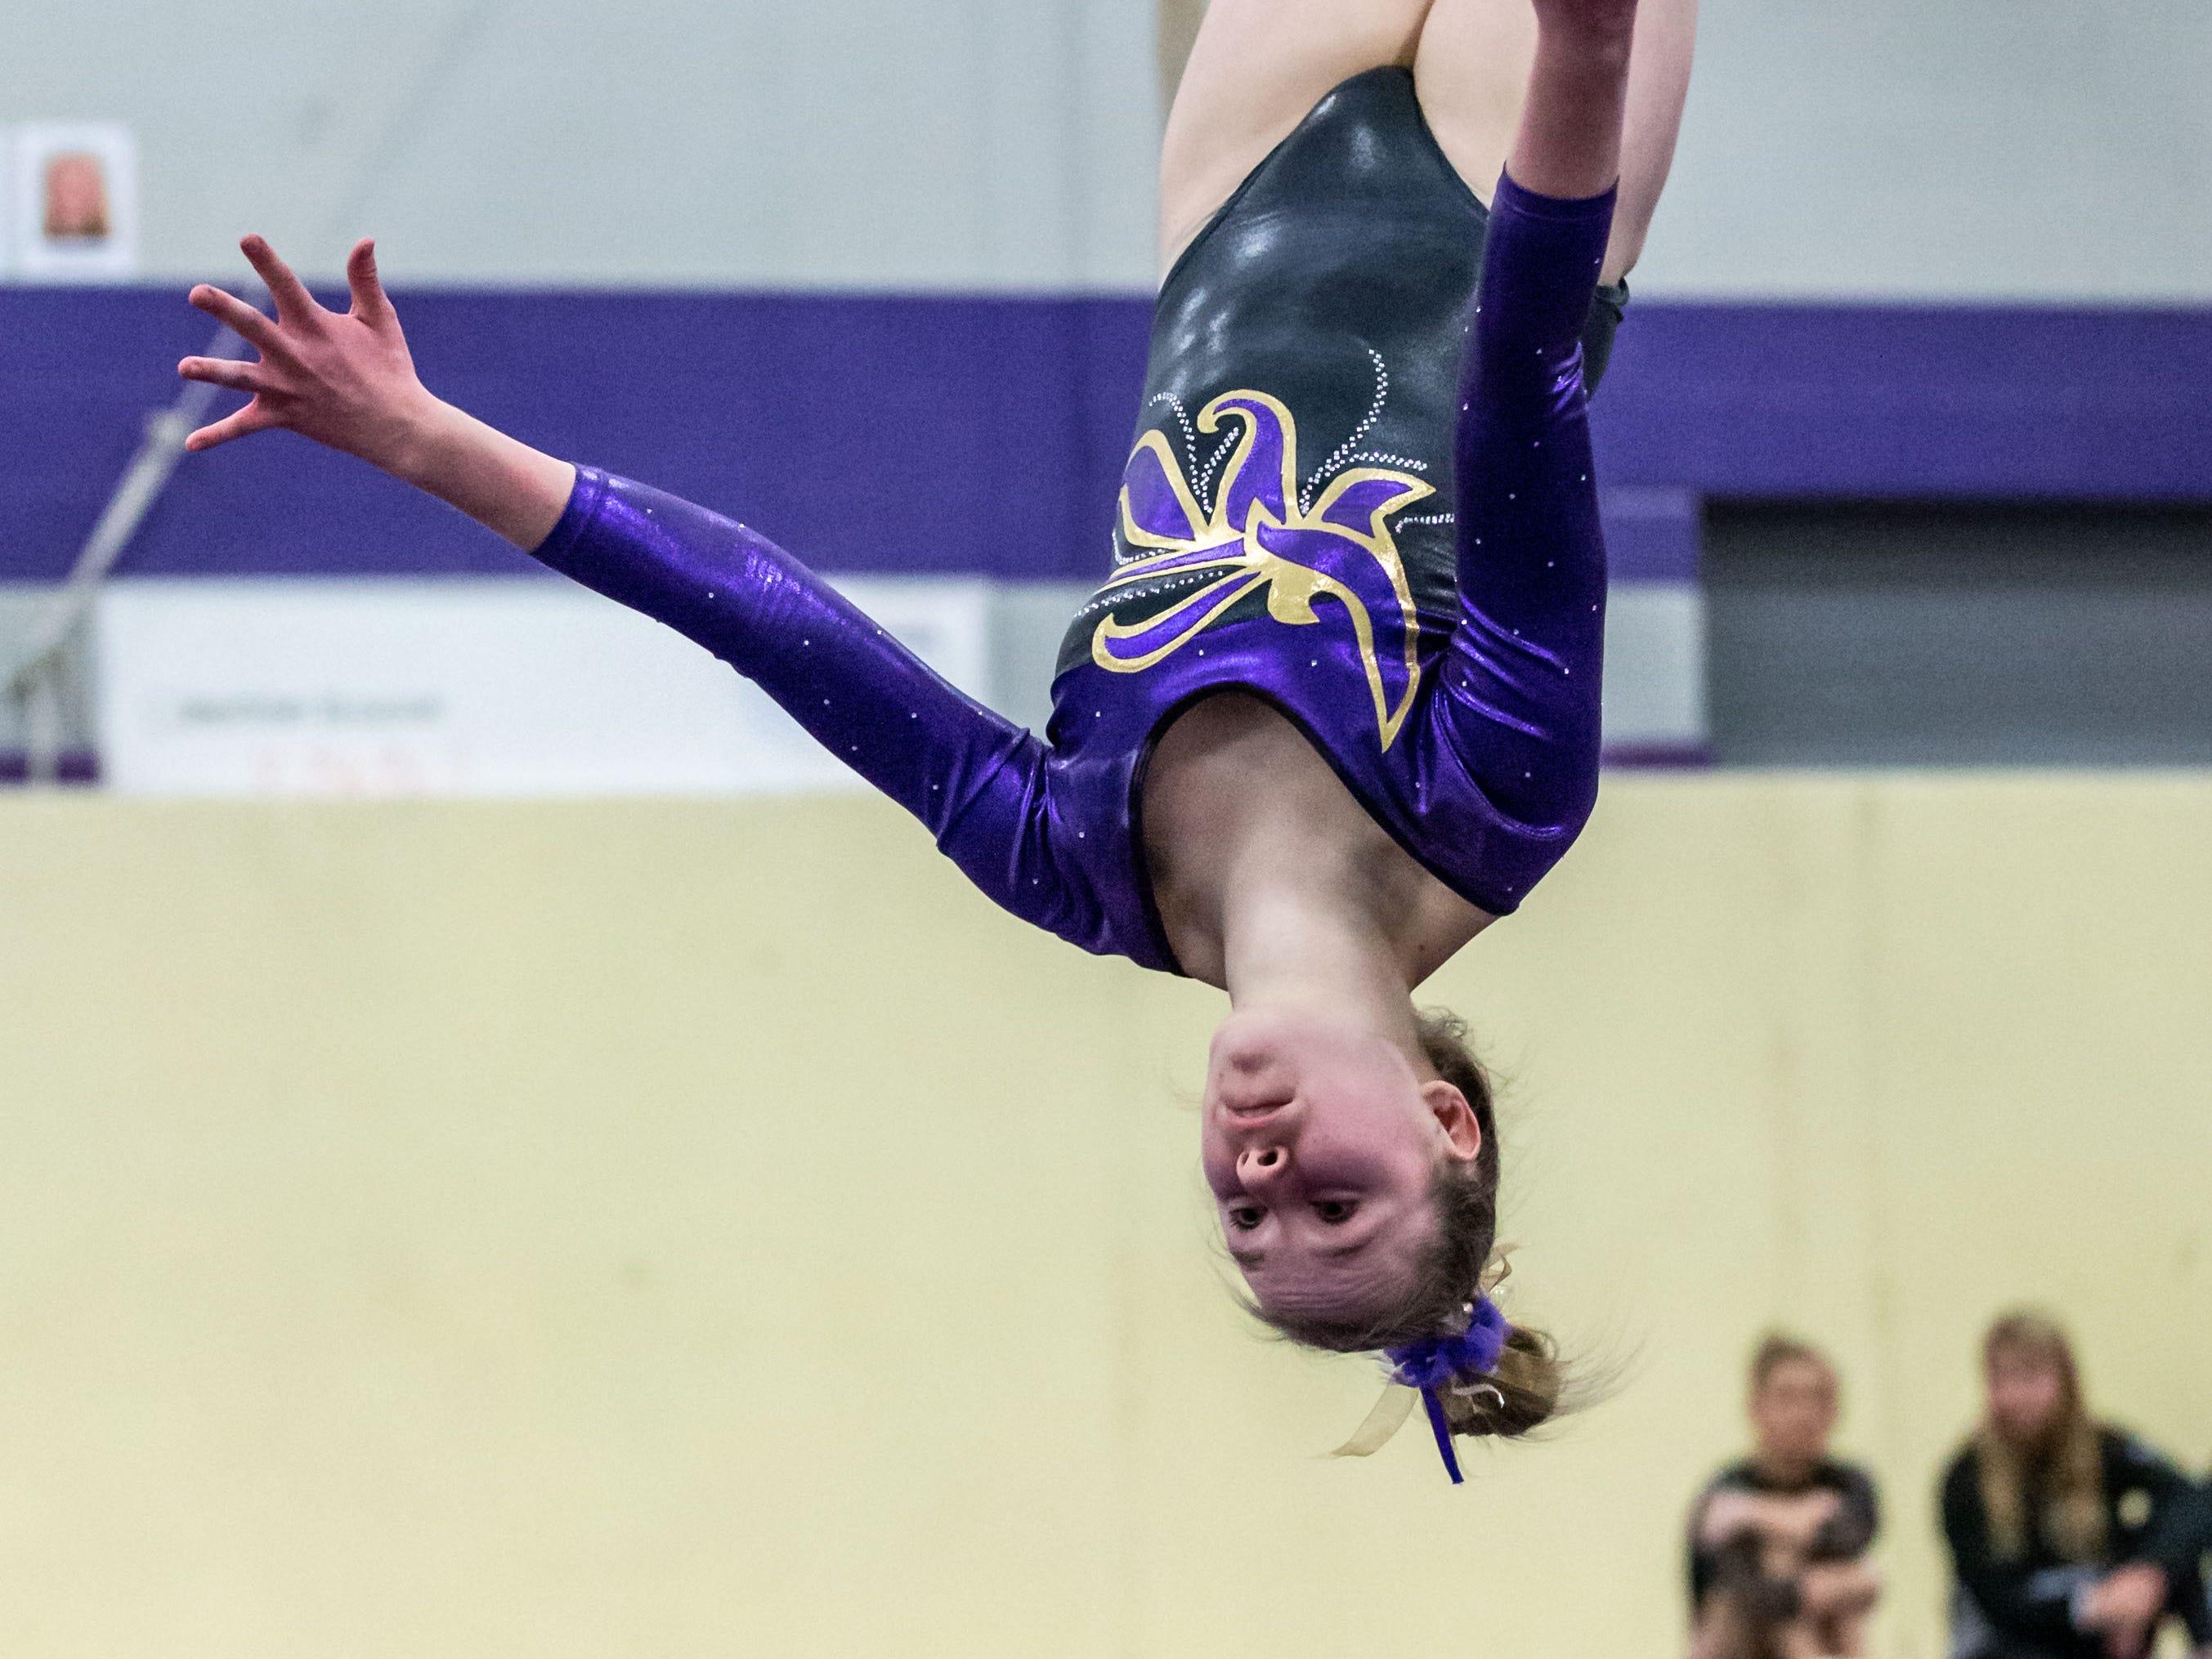 Oconomowoc gymnast Iris Laabs competes on the floor during the tri-meet at Oconomowoc on Thursday, Jan. 3, 2019.